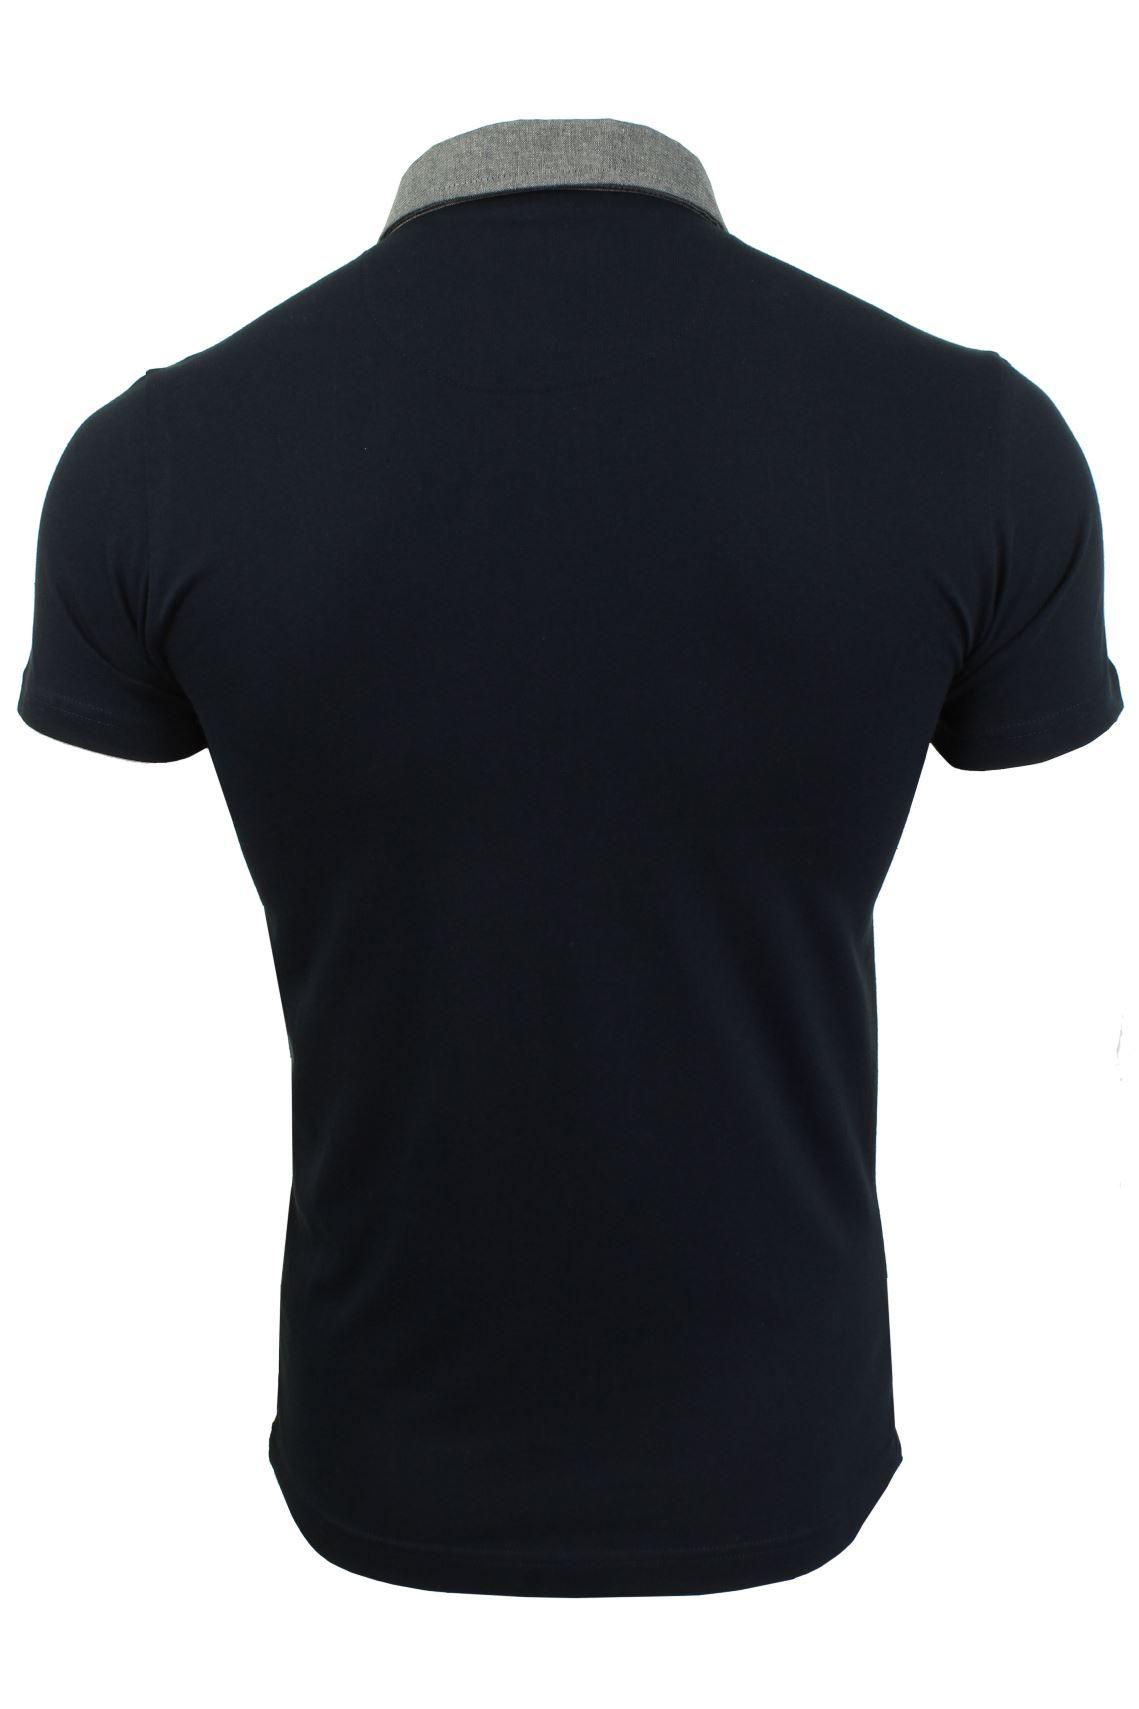 Mens-Polo-T-Shirt-Chimera-Brave-Soul-Denim-Chambray-Collar-Short-Sleeved-Cotton thumbnail 26